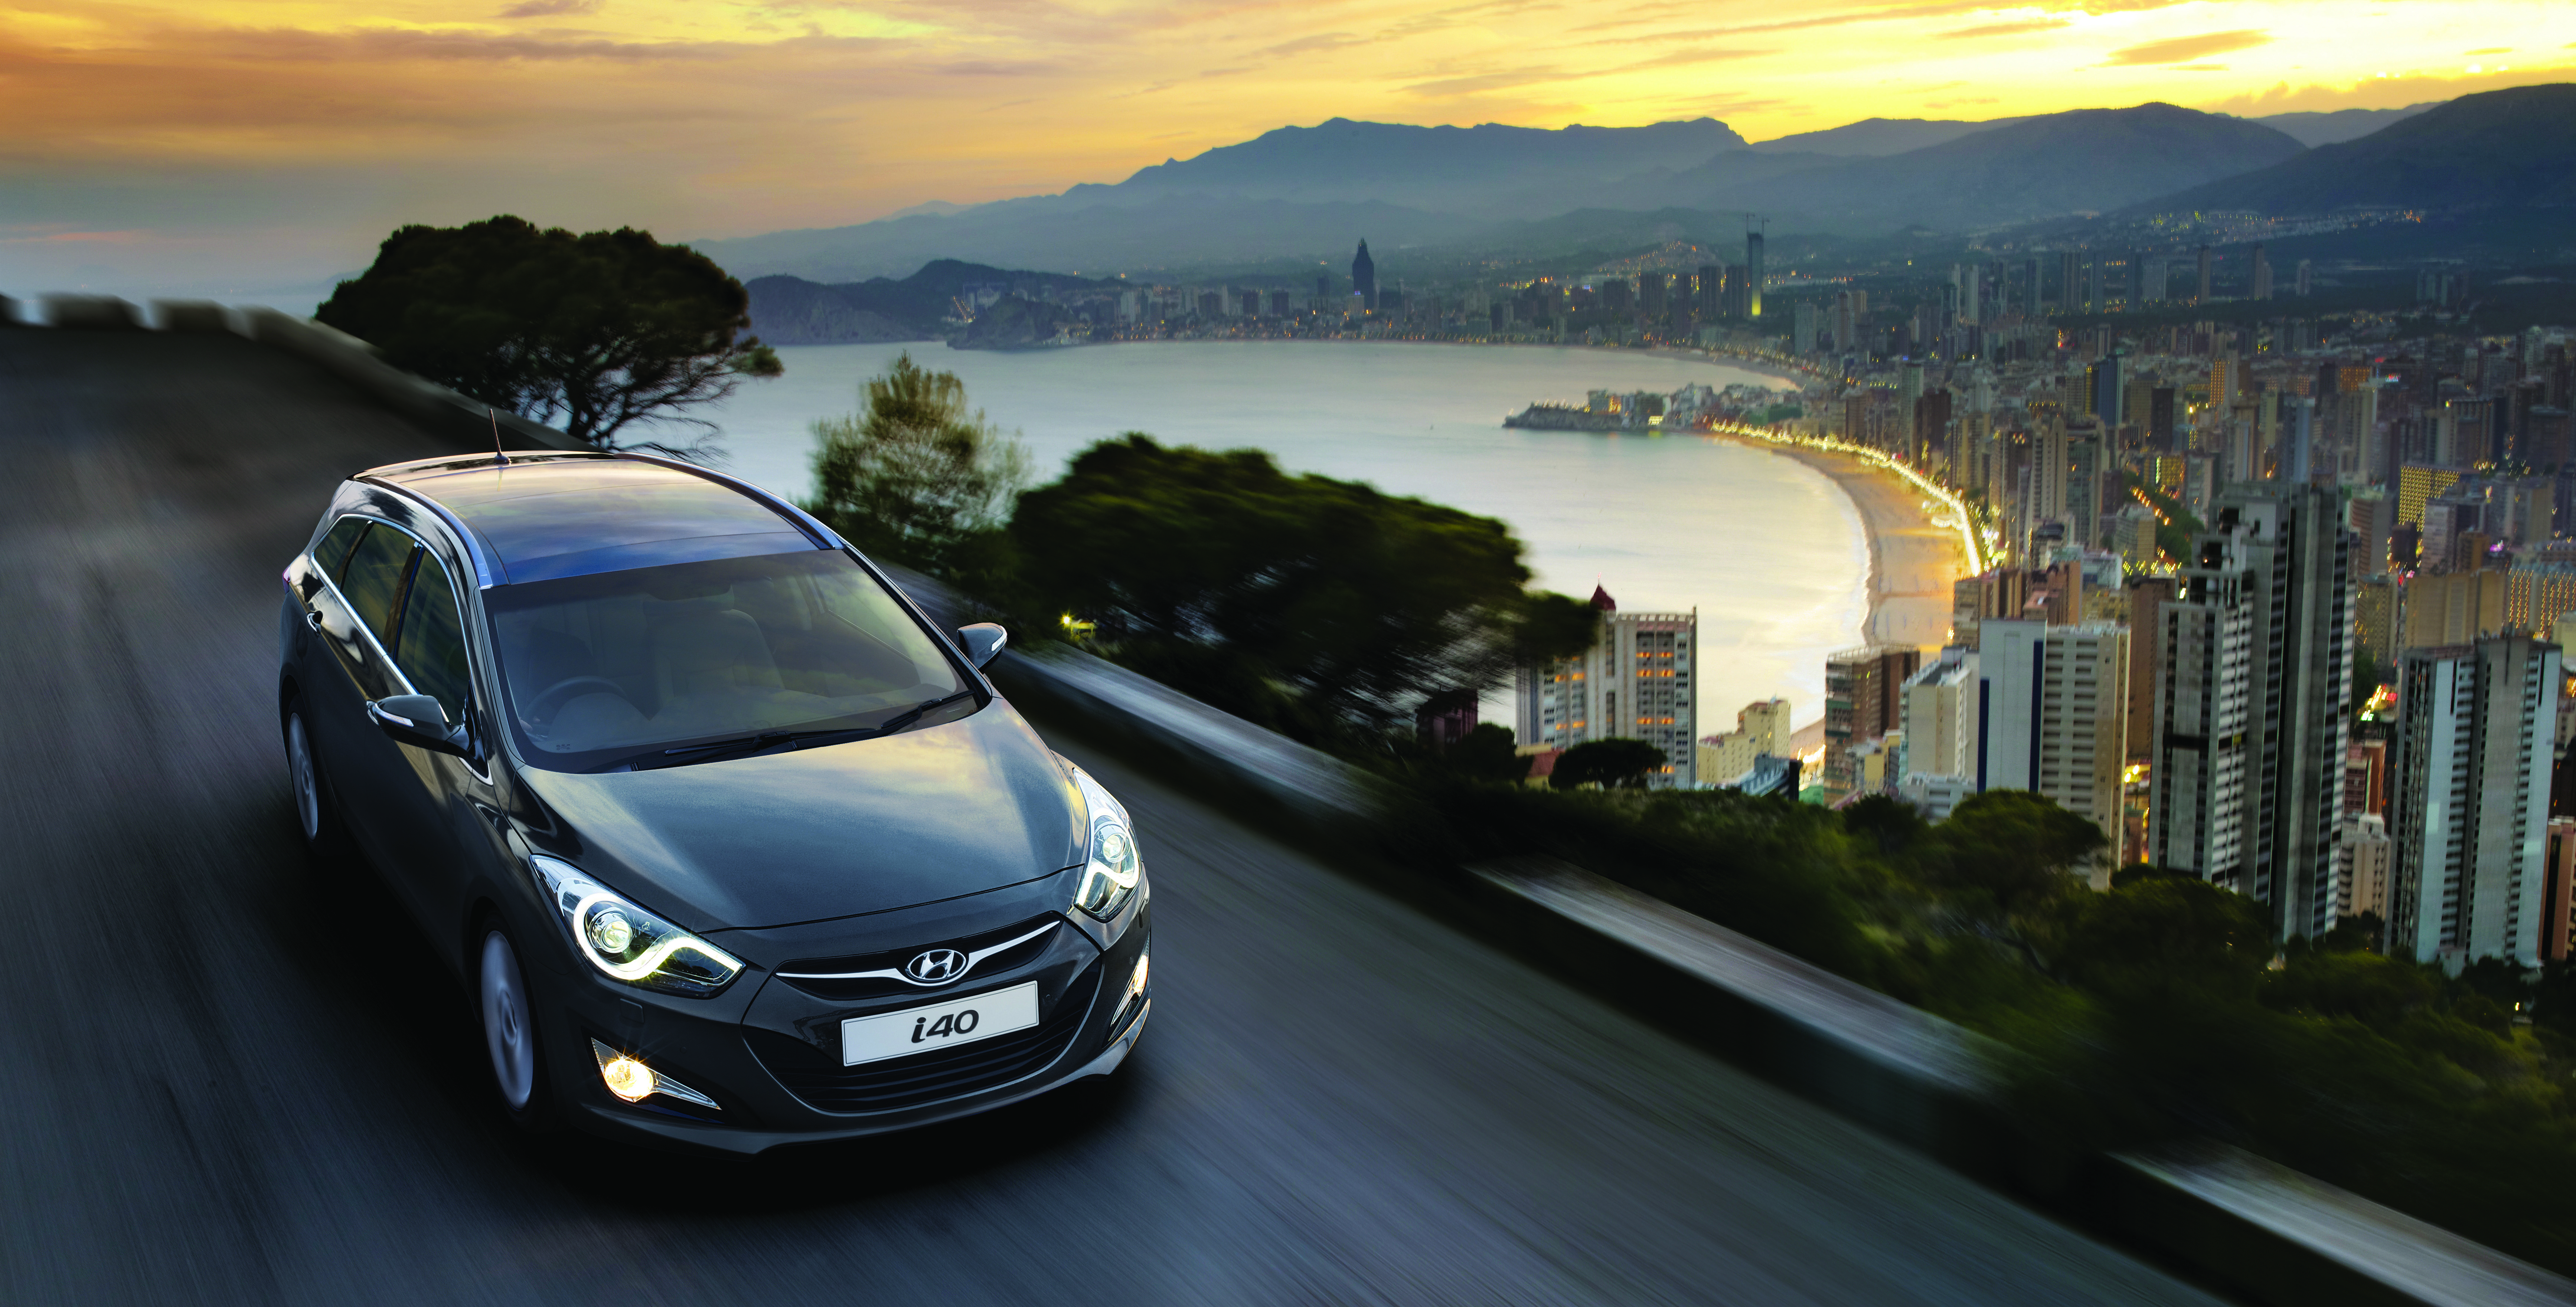 Hyundai Sonata 2018 Malaysia >> Hyundai i40 Sedan and Tourer launched in Malaysia – duo priced and positioned above the Sonata ...